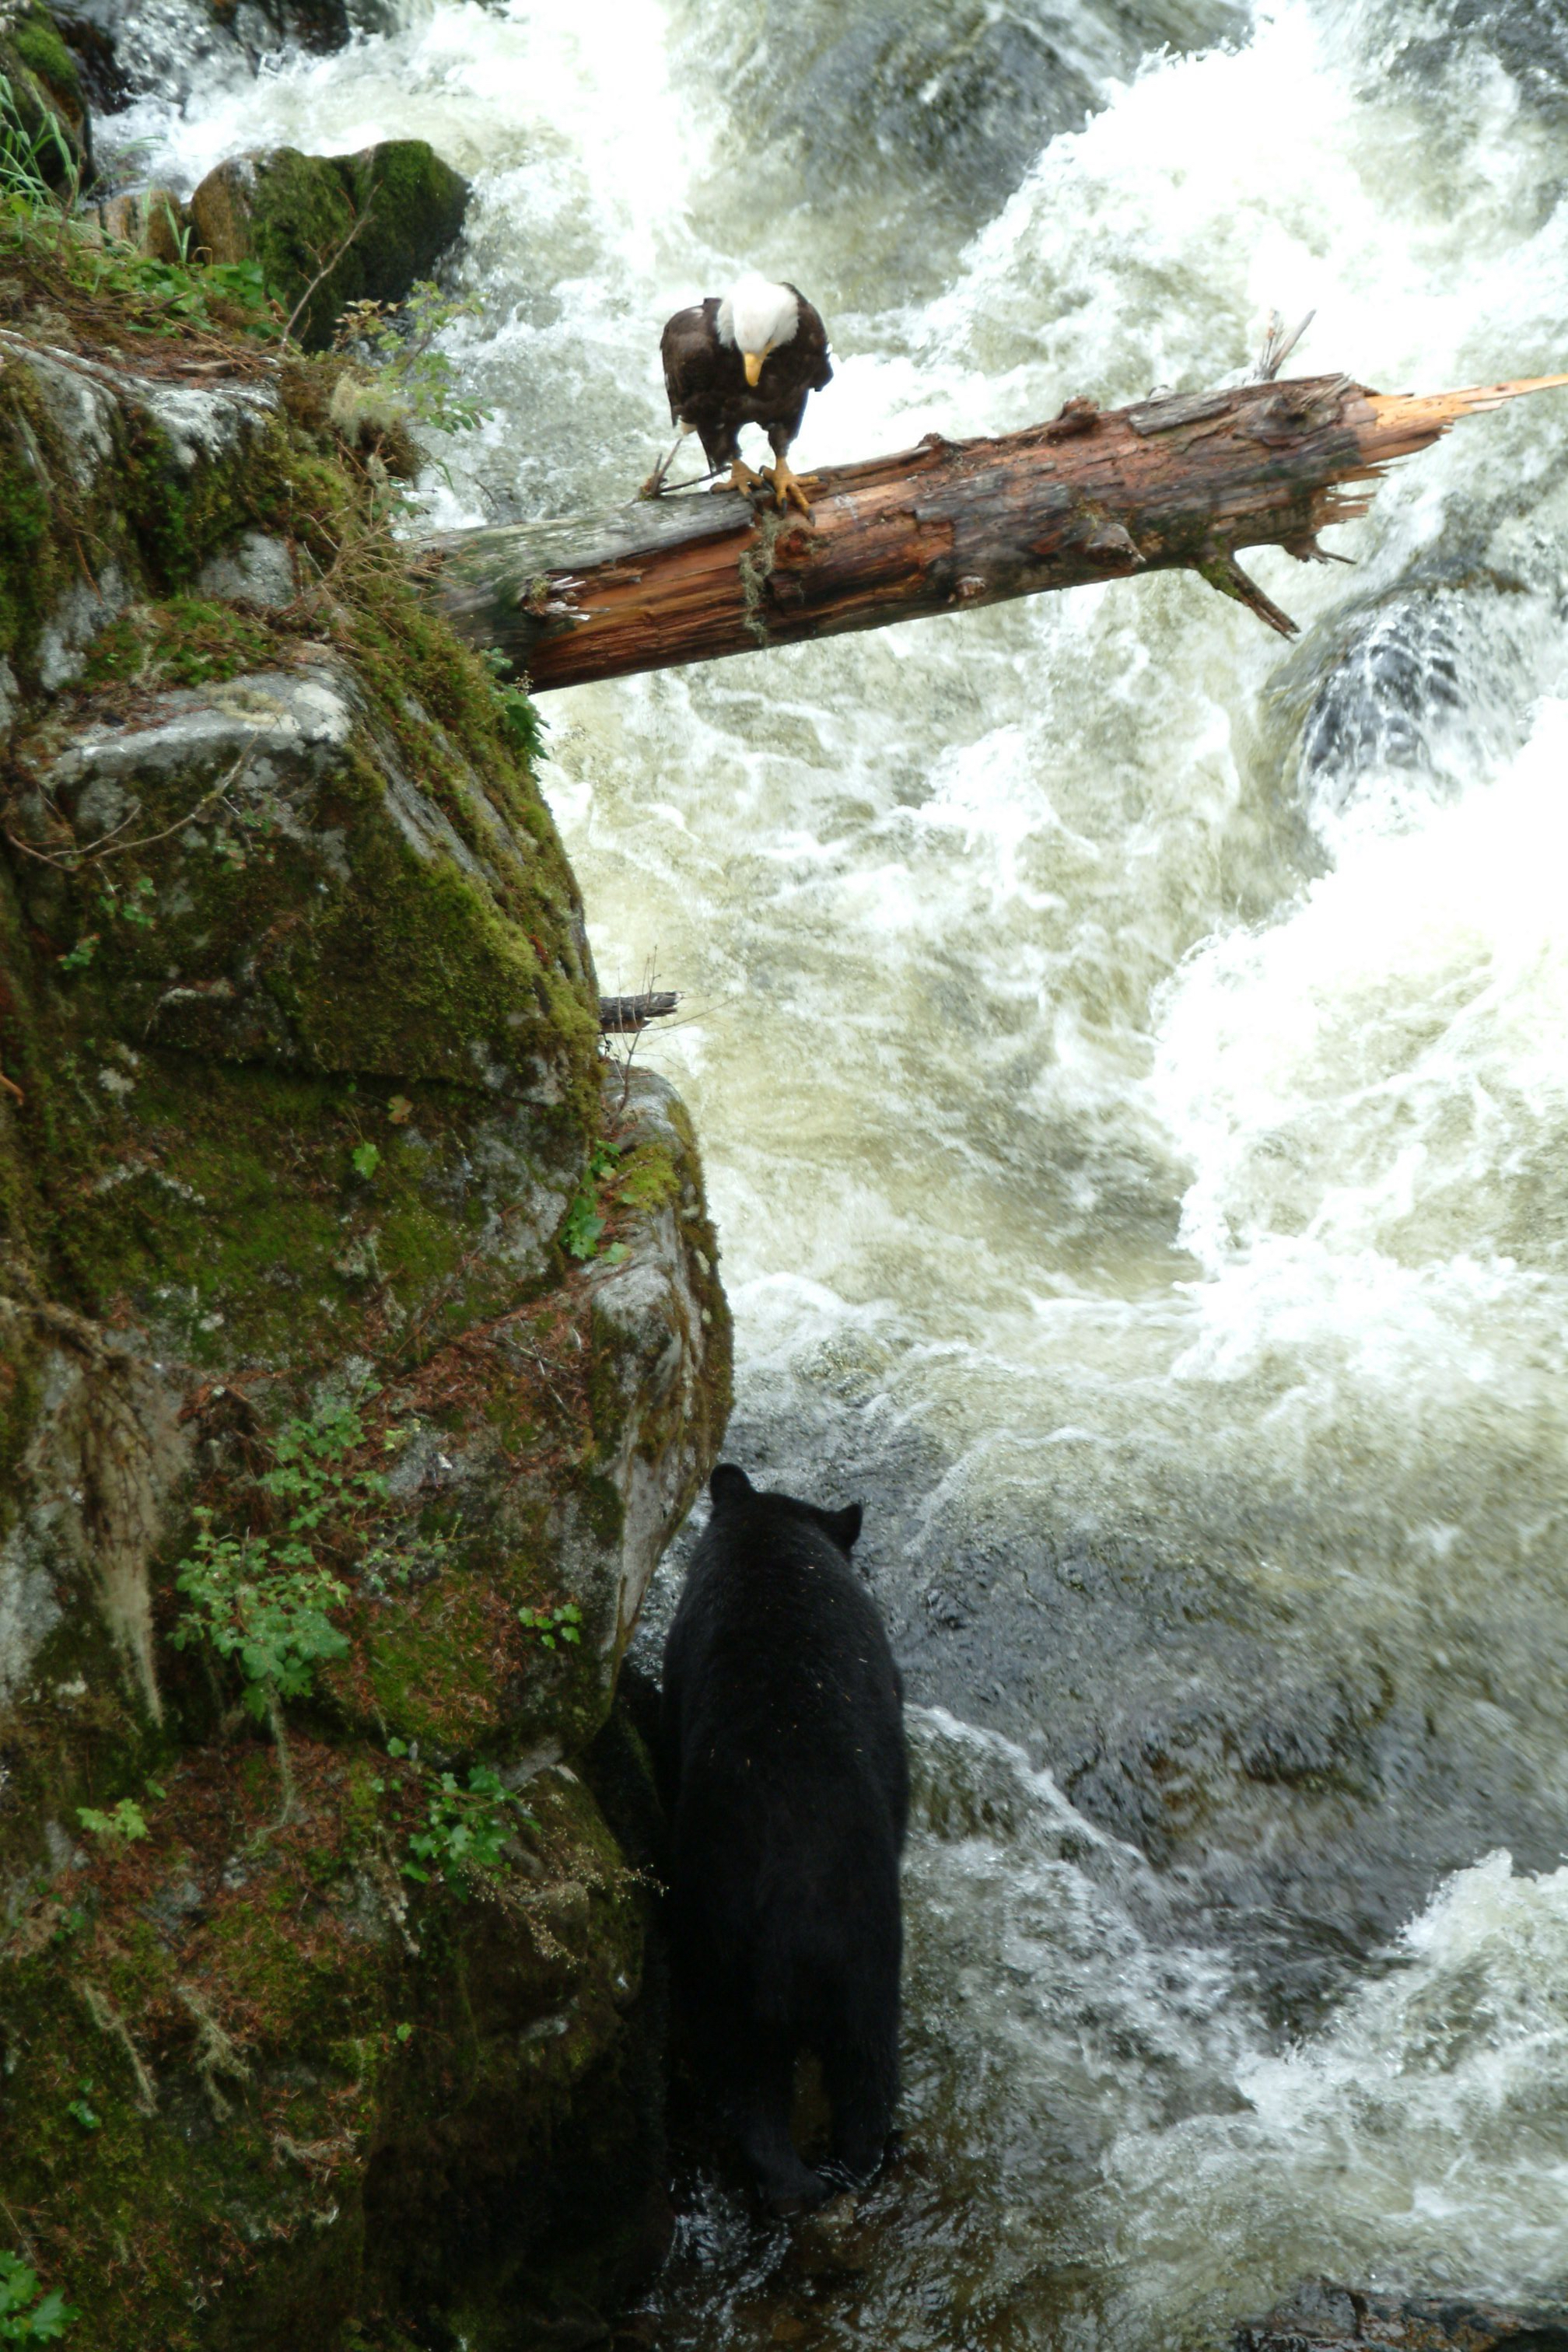 #eagles, #bear, #salmon, #July, #alaska, #wrangell, #silversea, #wildlife